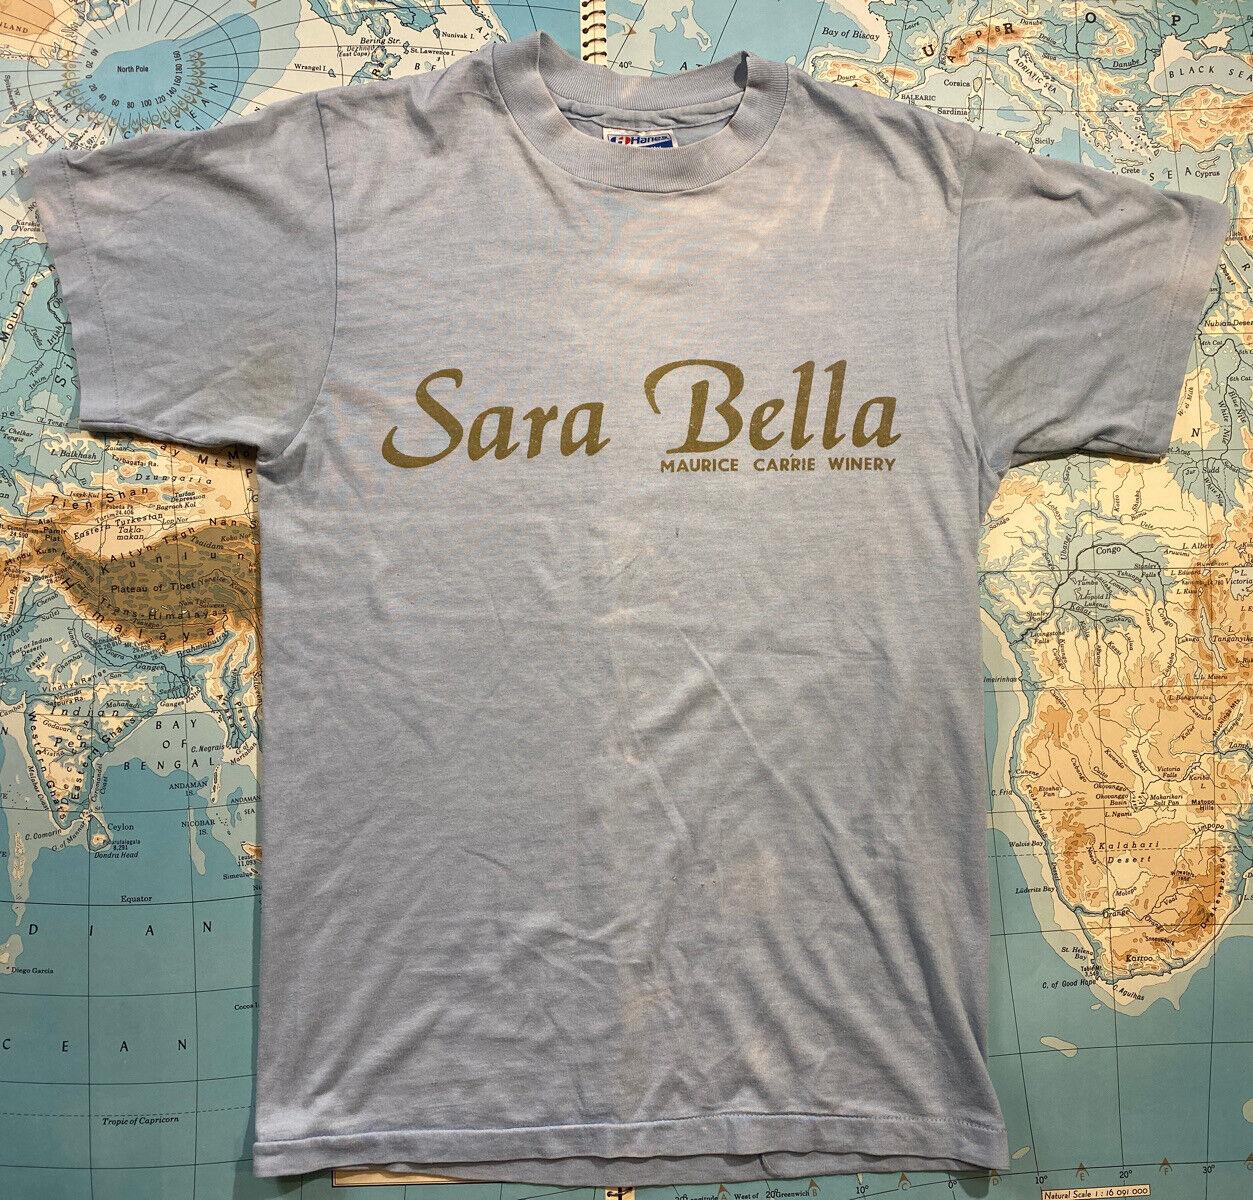 VTG 80s Tシャツ Maurice Carrie Winery Sara Bella Cab Sav Rose Thin Soft スラッシュ